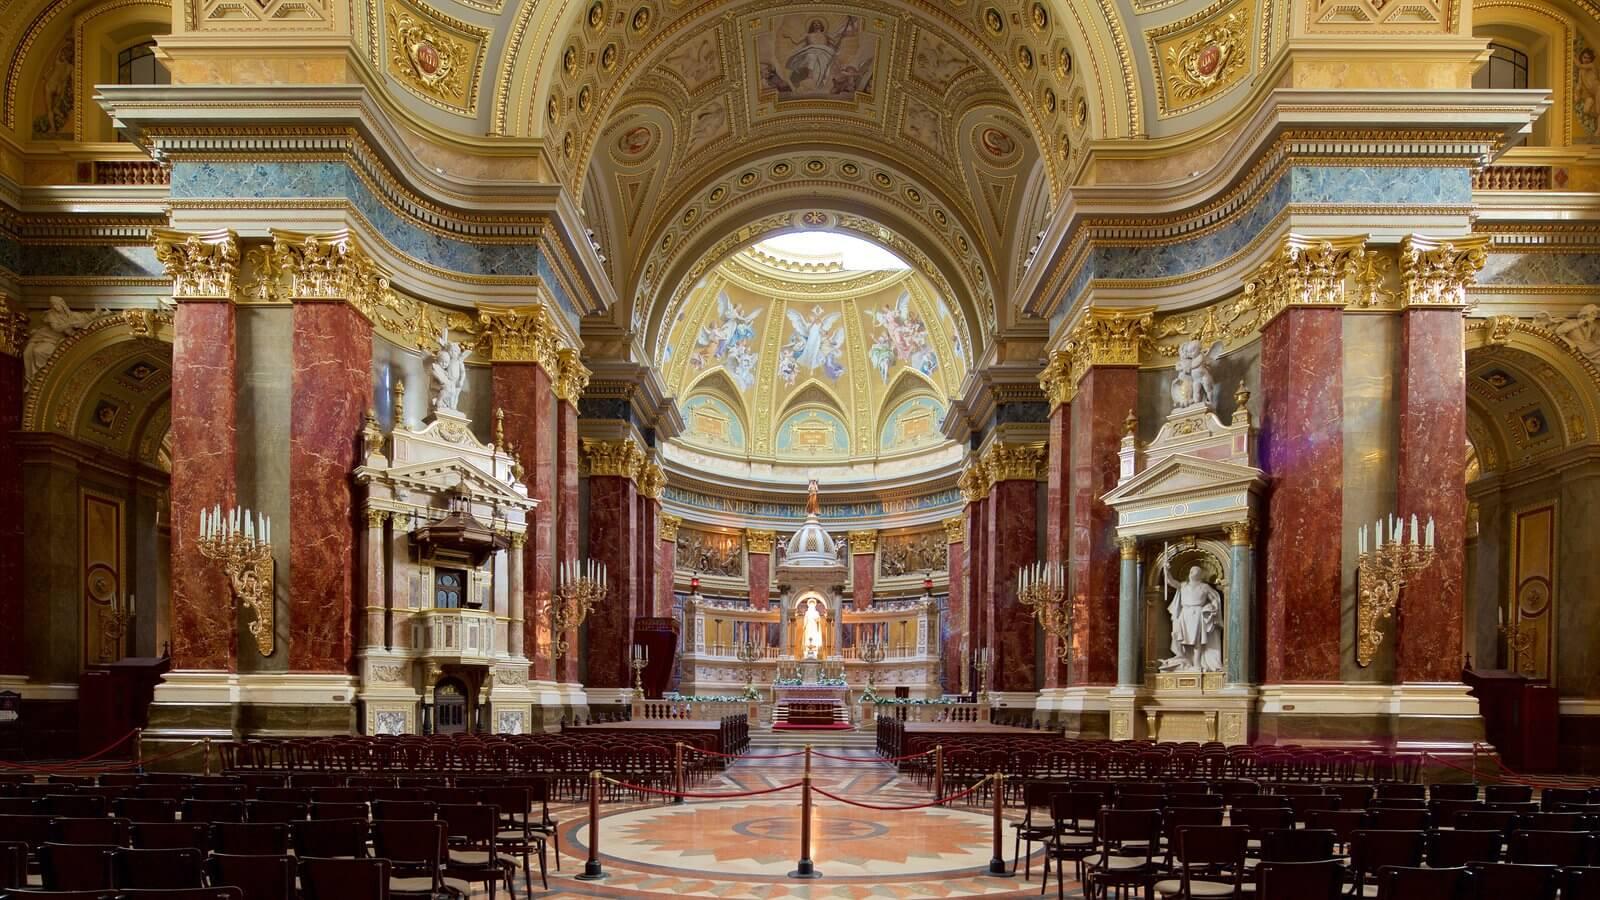 Catedrala Sf Stefan, Budapesta - interior